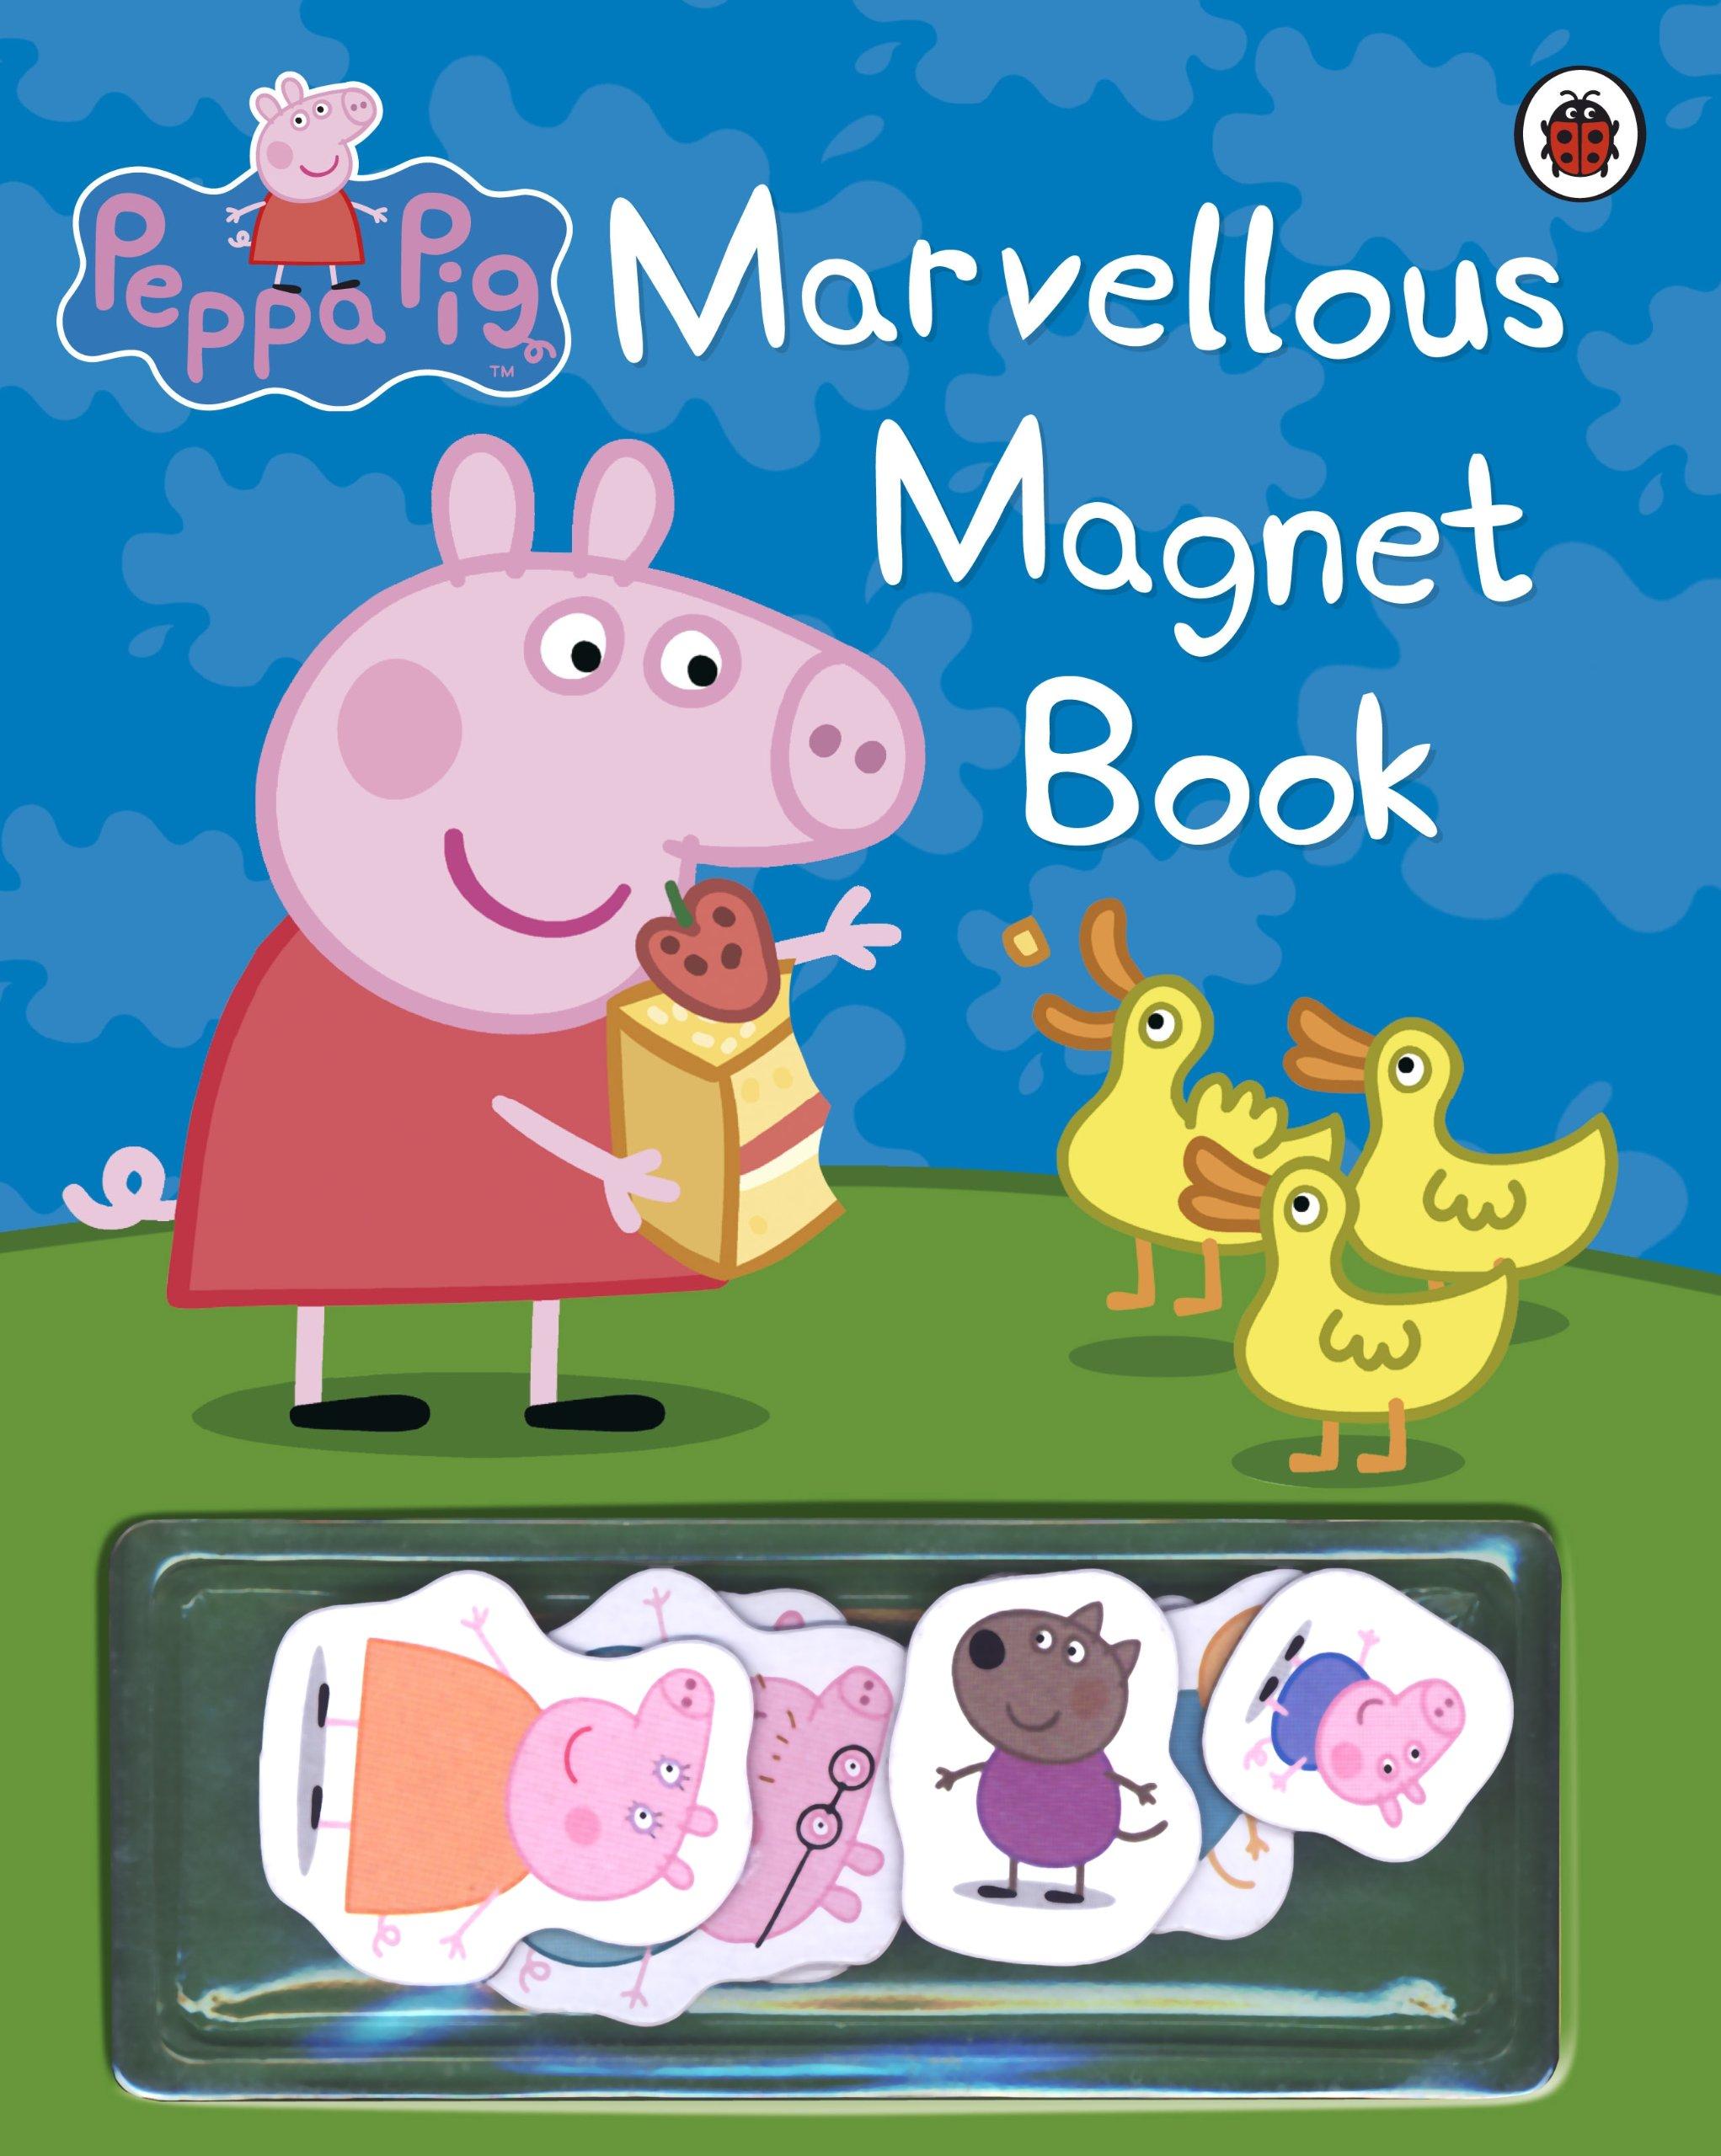 Peppa Pig Marvellous Magnet Book Ladybird 9781409301769 Amazon Books